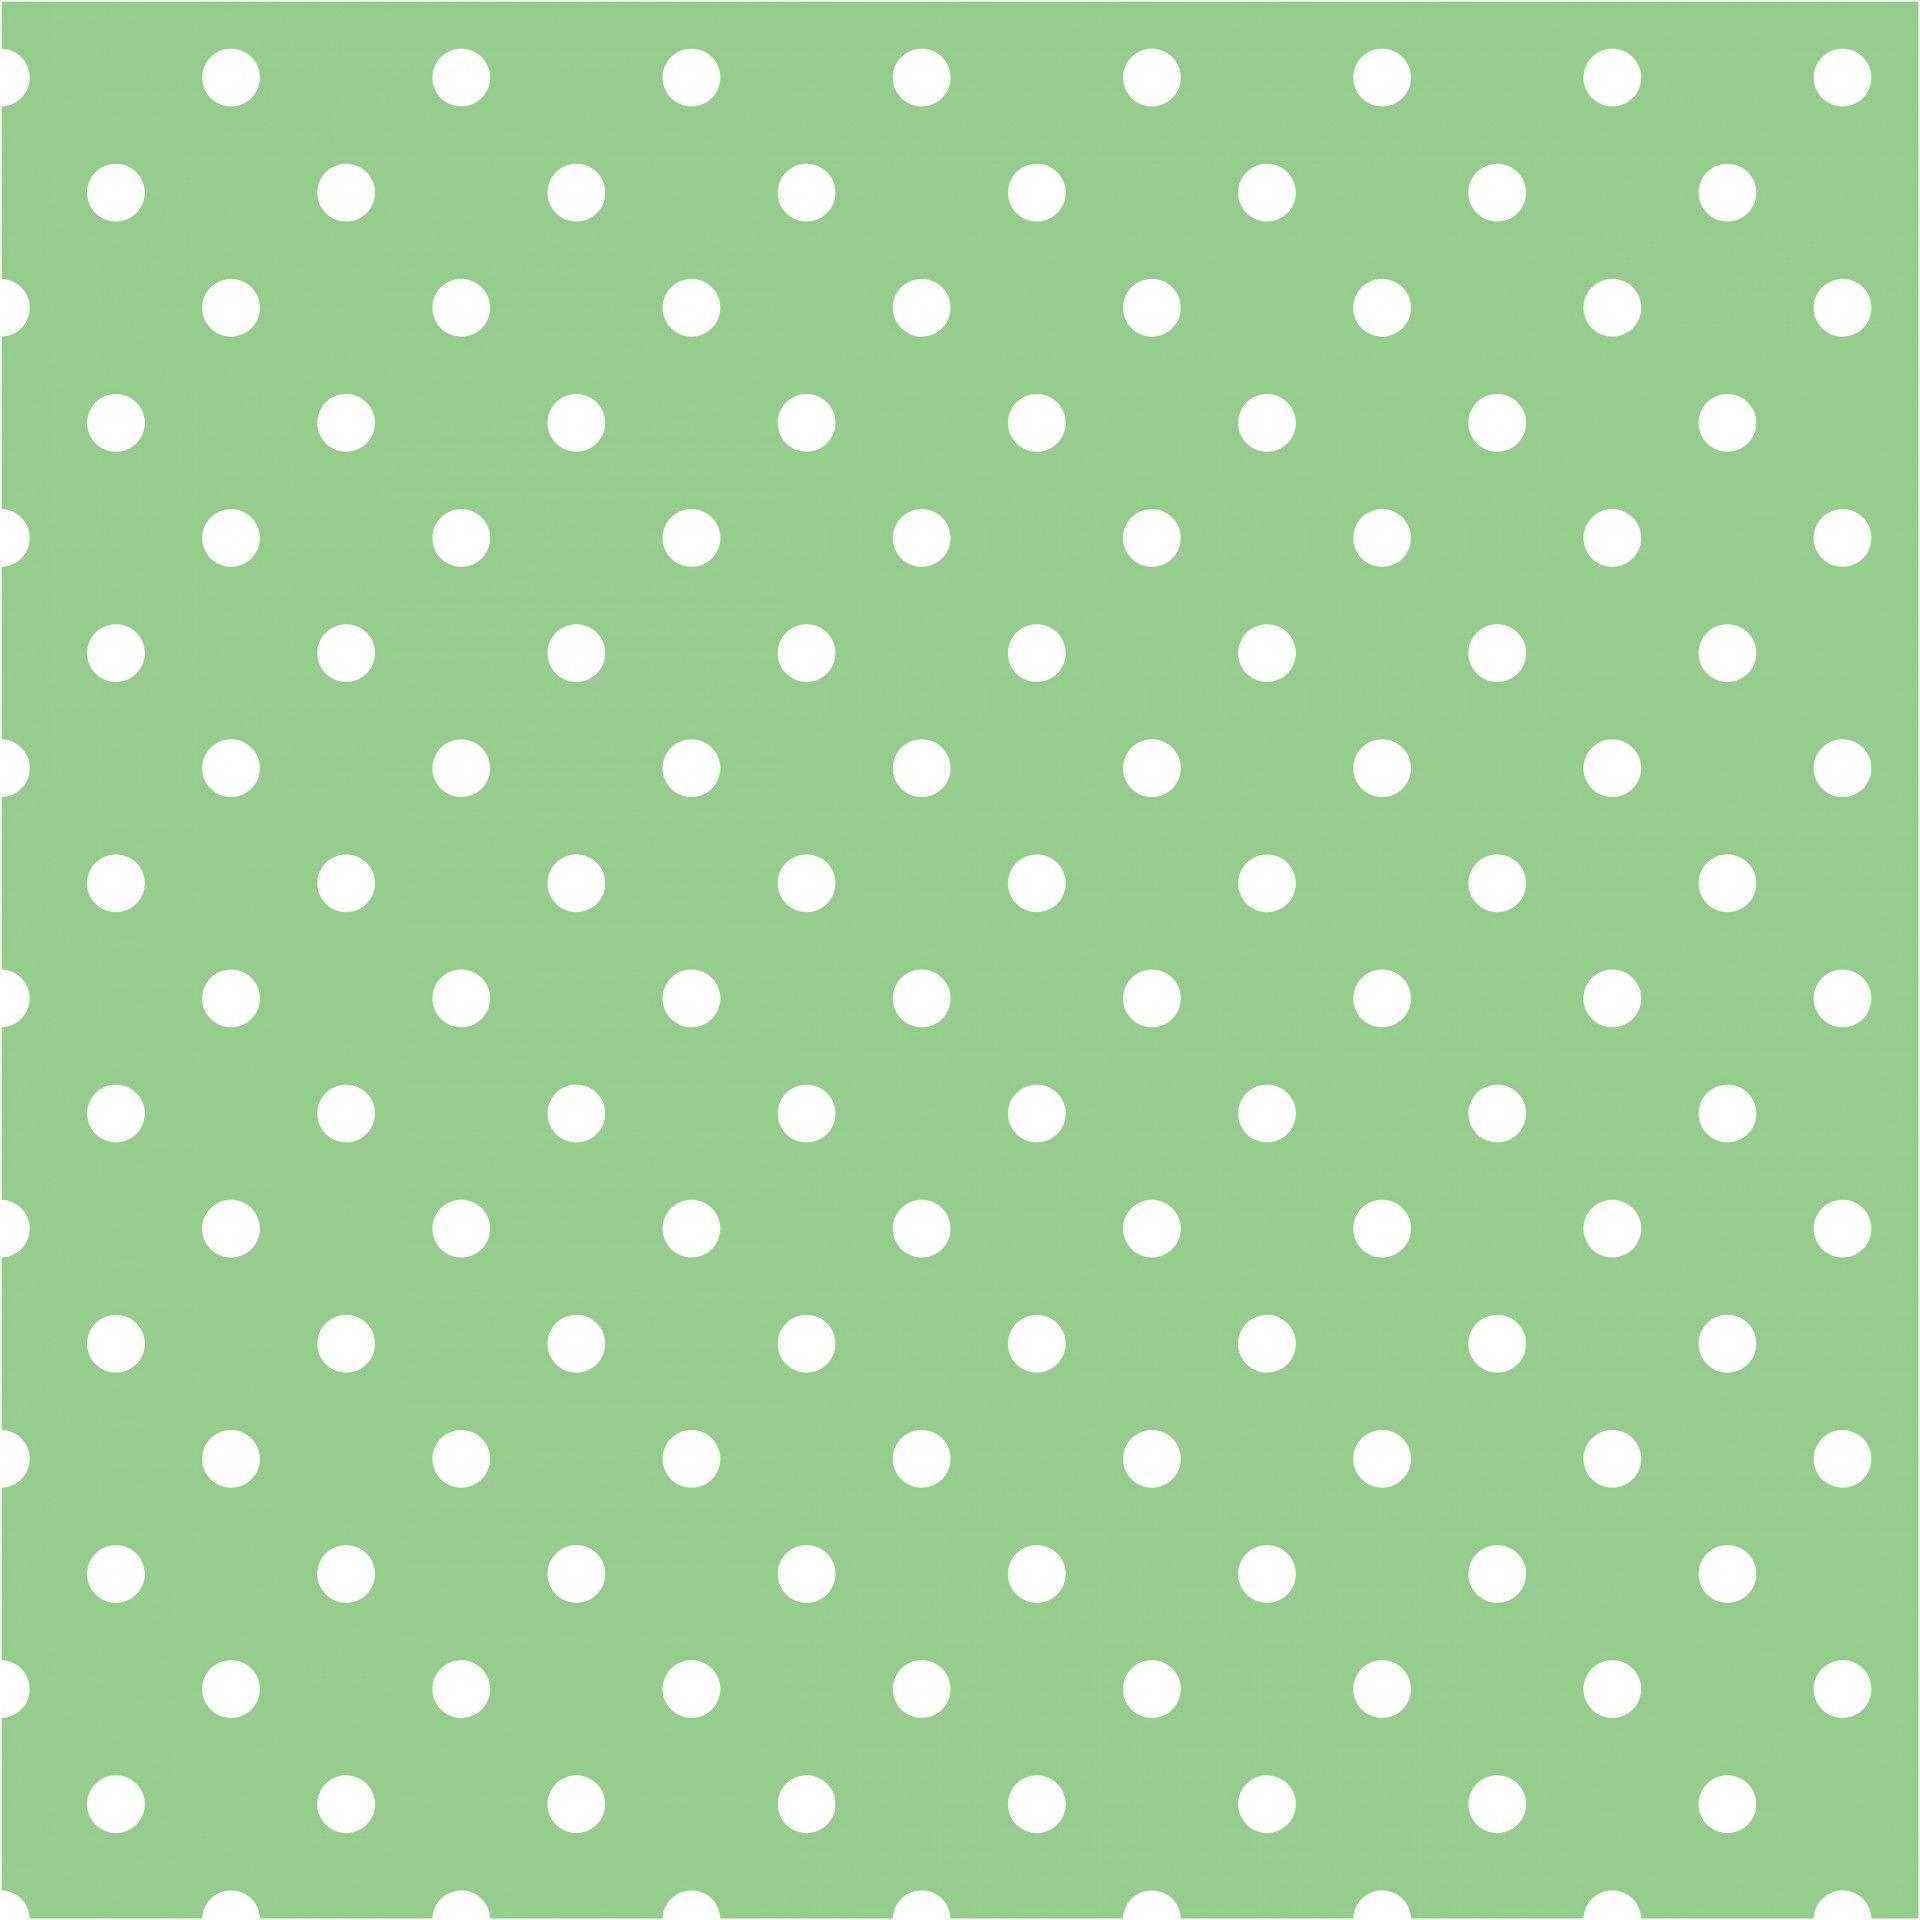 Green polka dot background library ideas pinterest green polka dot background voltagebd Images